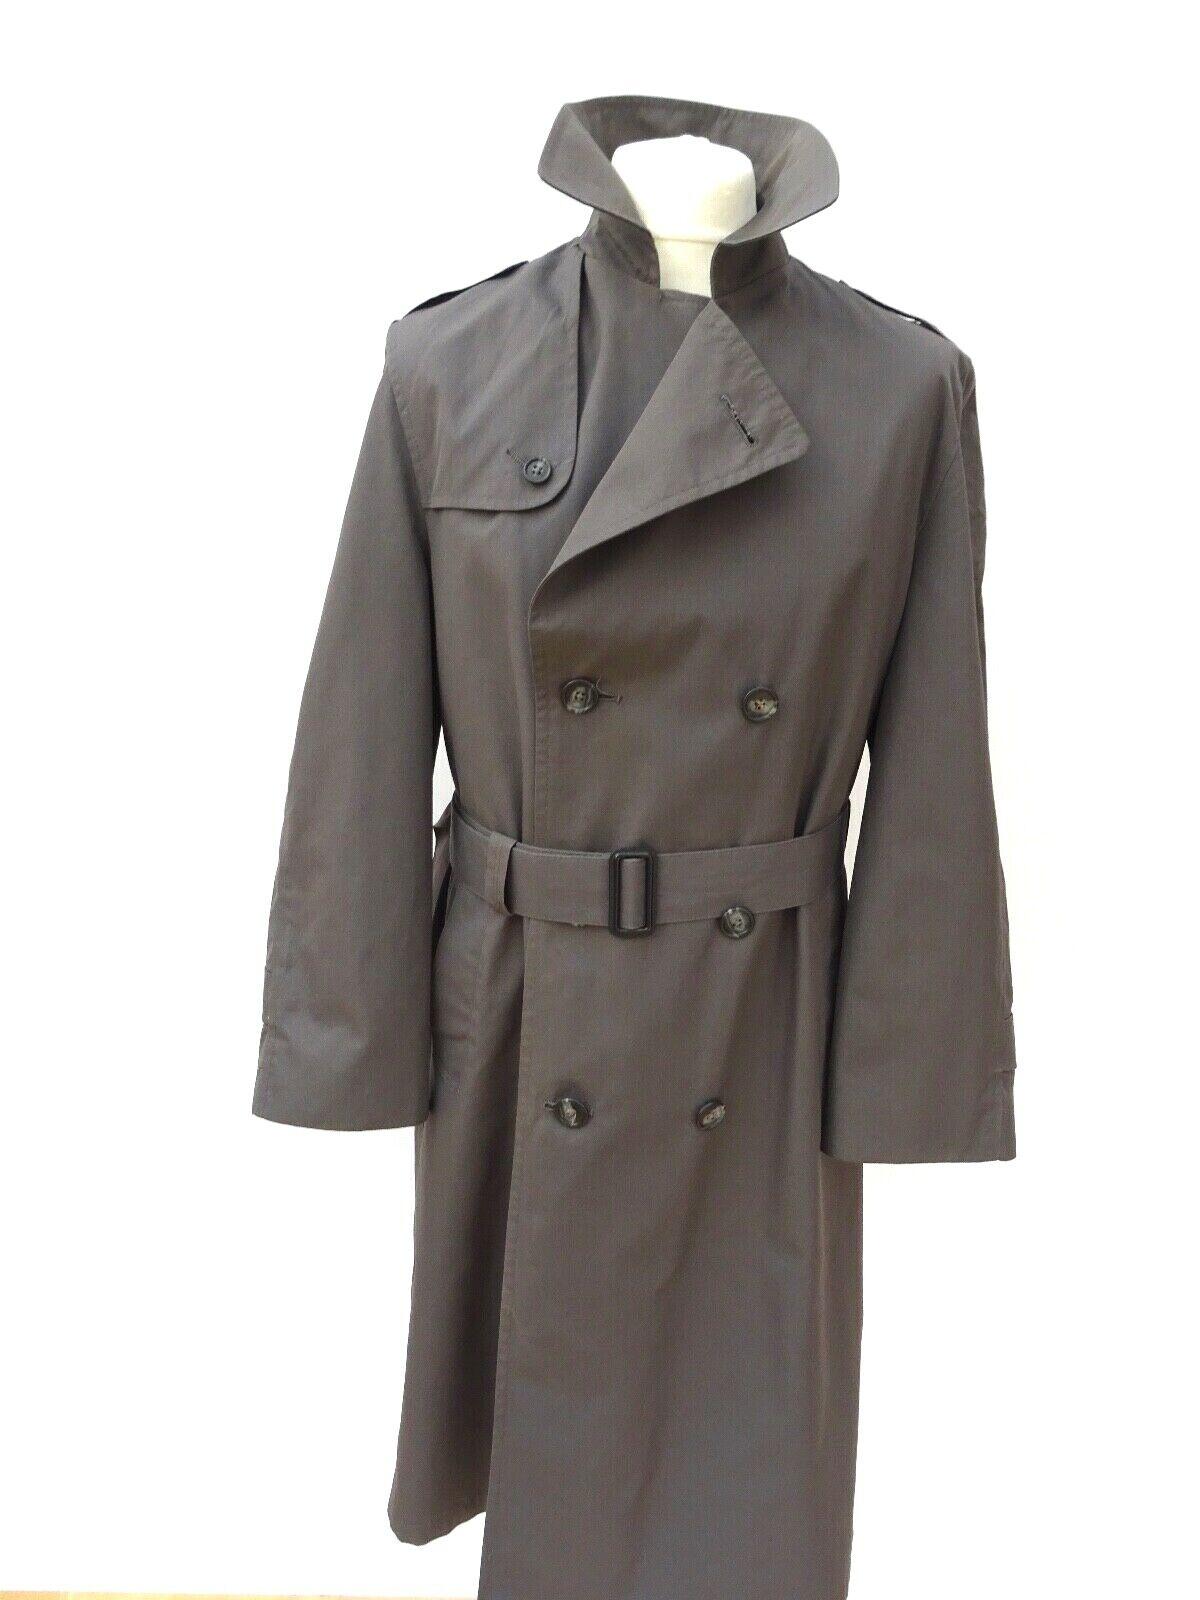 Christian Dior Monsieur Sport grau grau grau Vintage Trench Coat Rain Mac Größe 40R   3678 | Die Farbe ist sehr auffällig  d1c37c